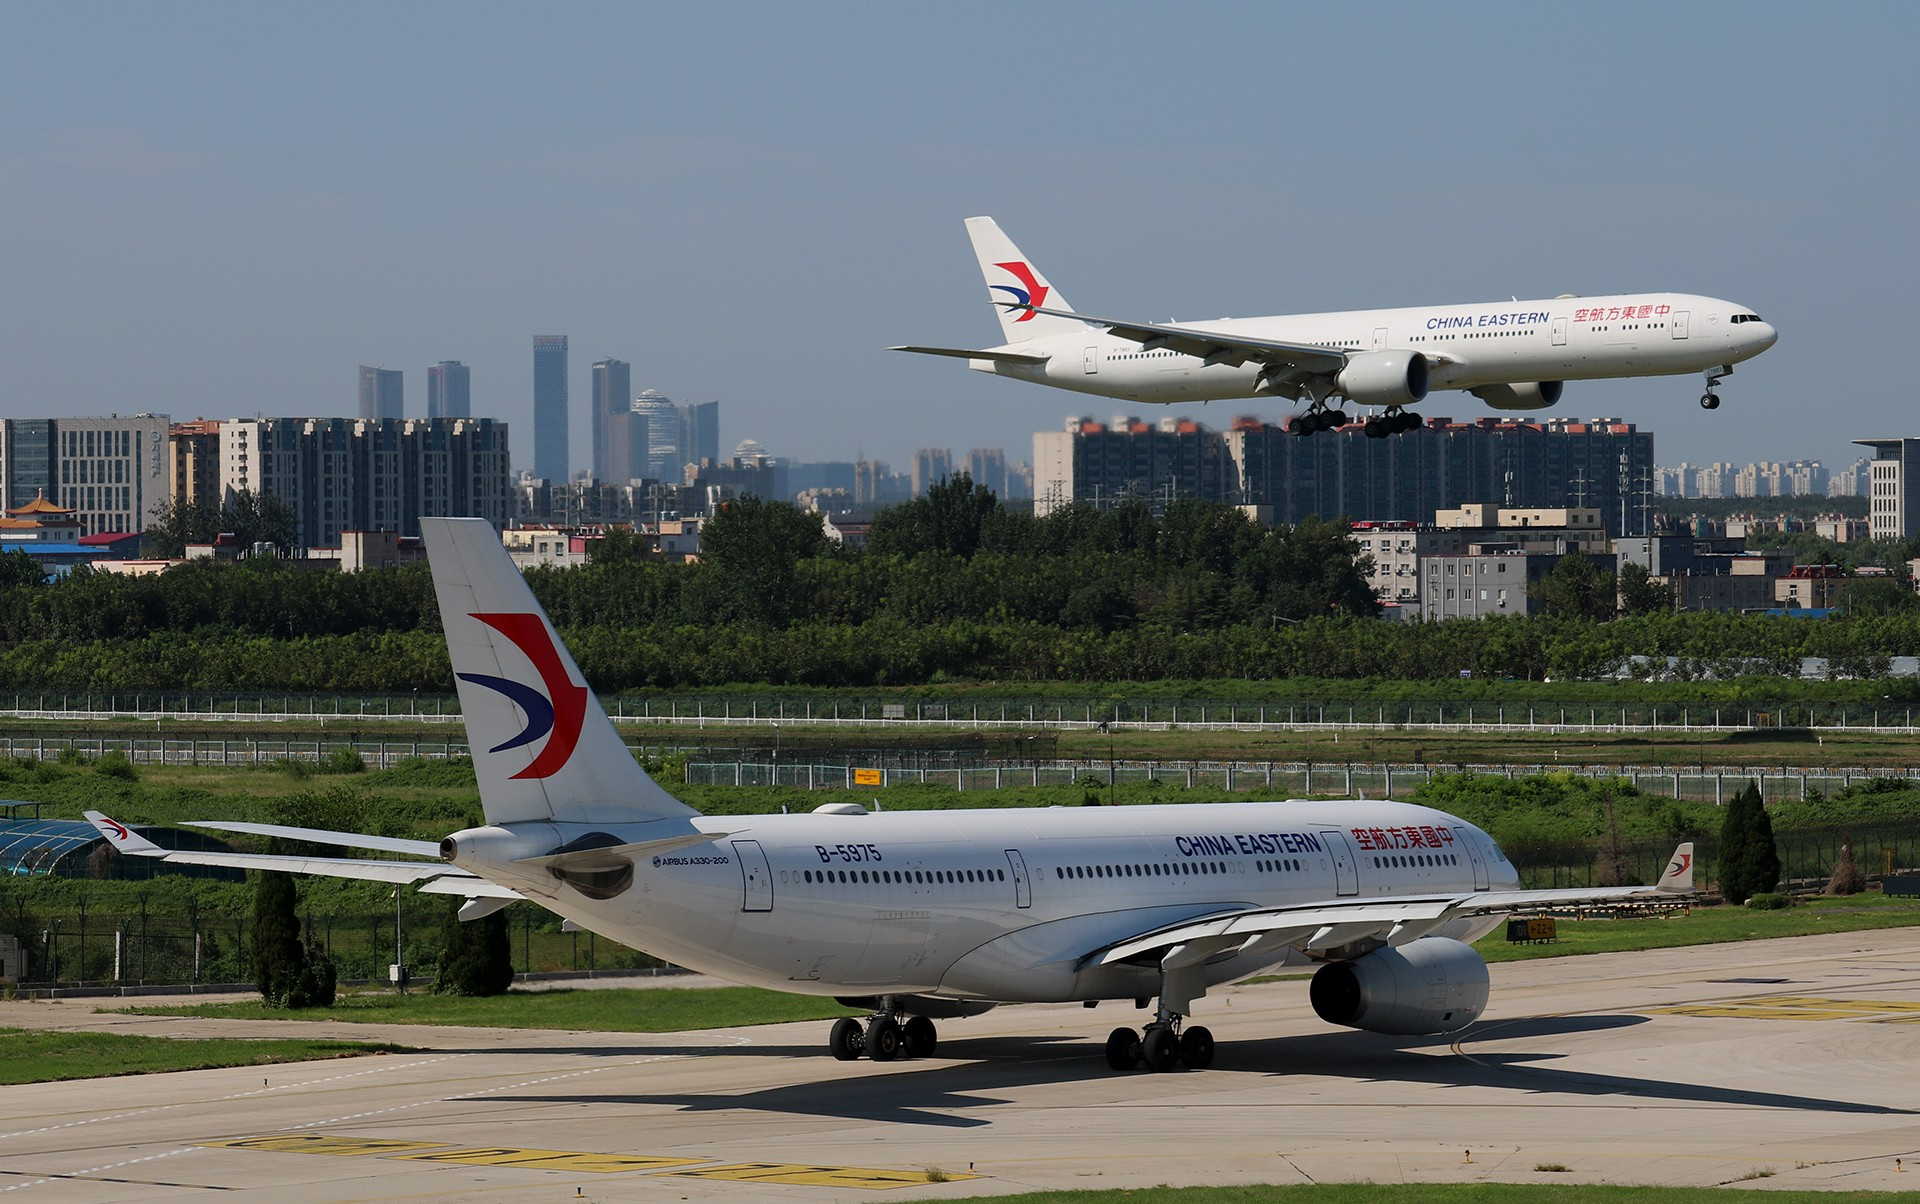 Re:[原创]LIULIU|【PEK】36L降落一组Ⅴ|城市背景下的进近 AIRBUS A330-200 B-5975 中国北京首都国际机场